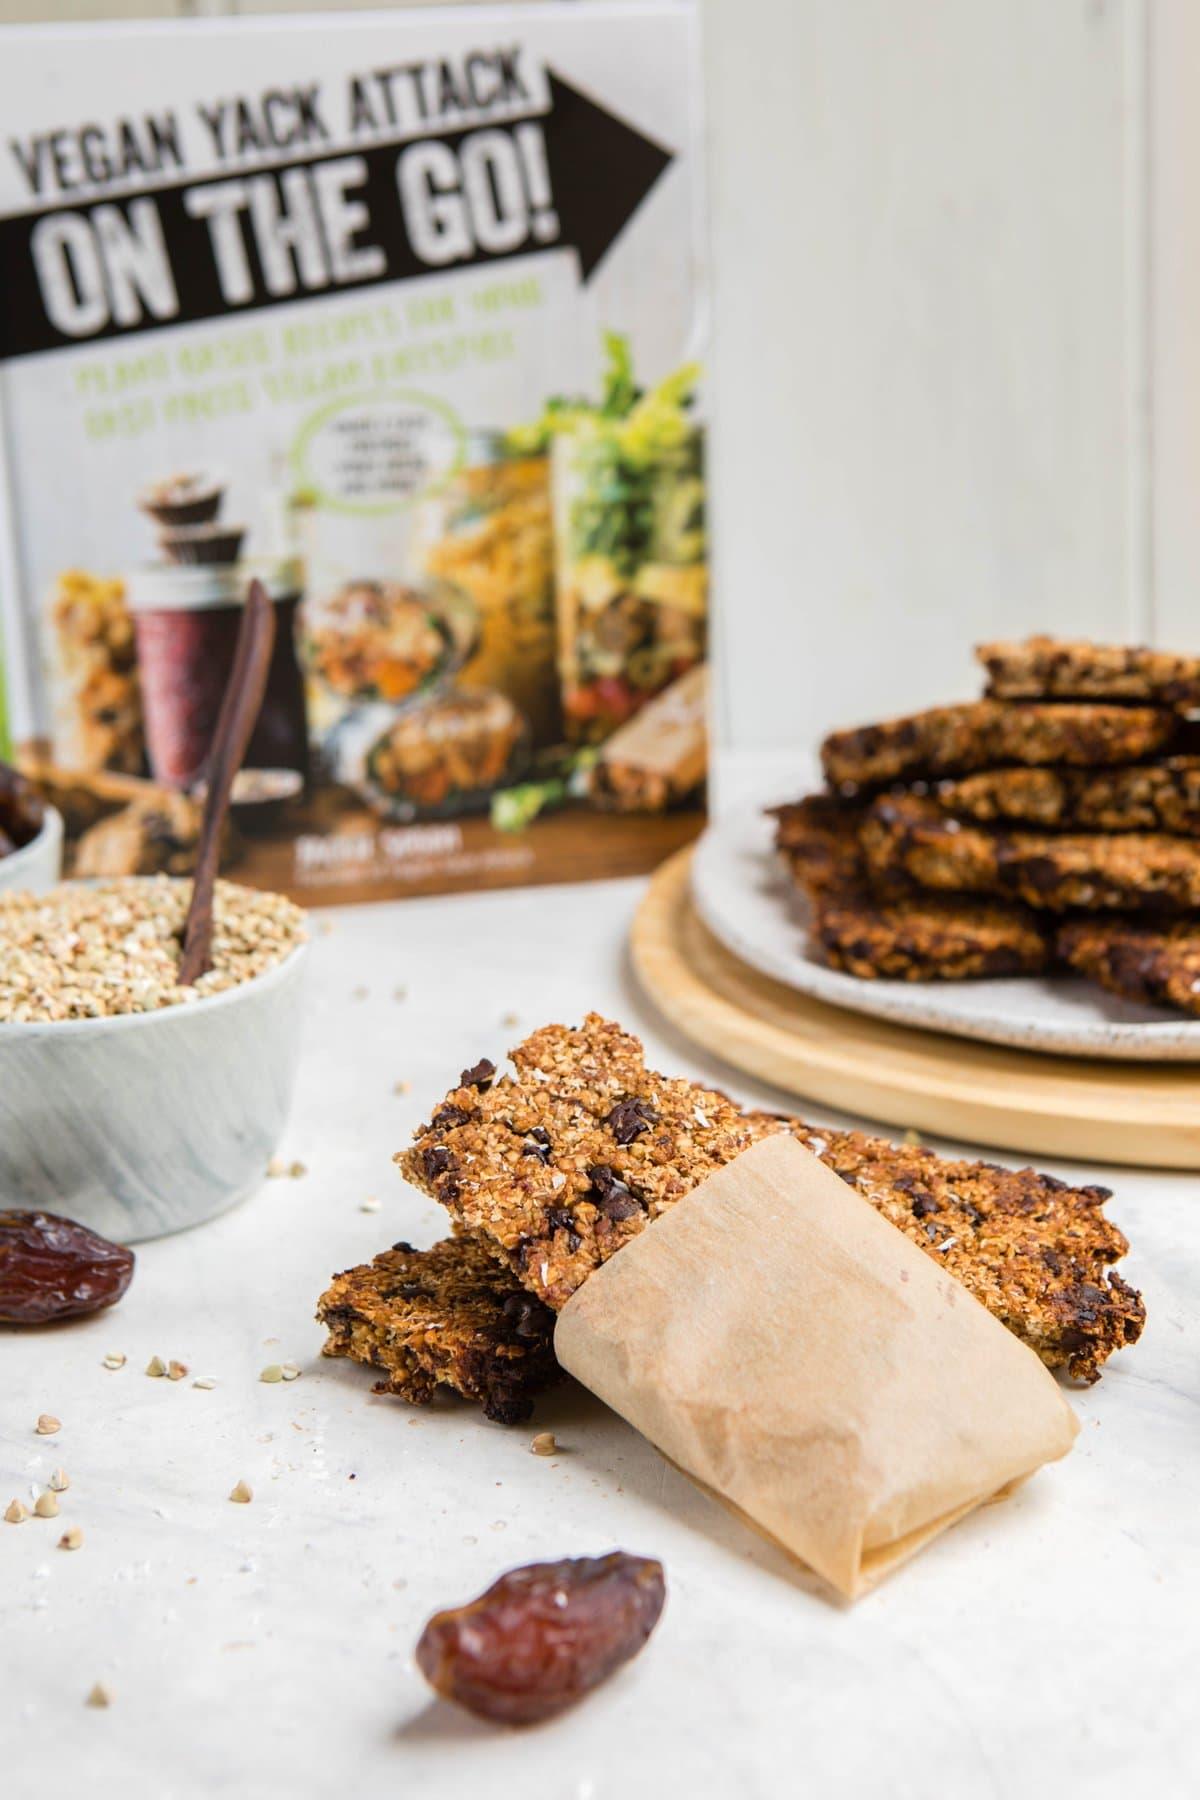 vanilla chip buckwheat bars with vegan yack attack cookbook in the background